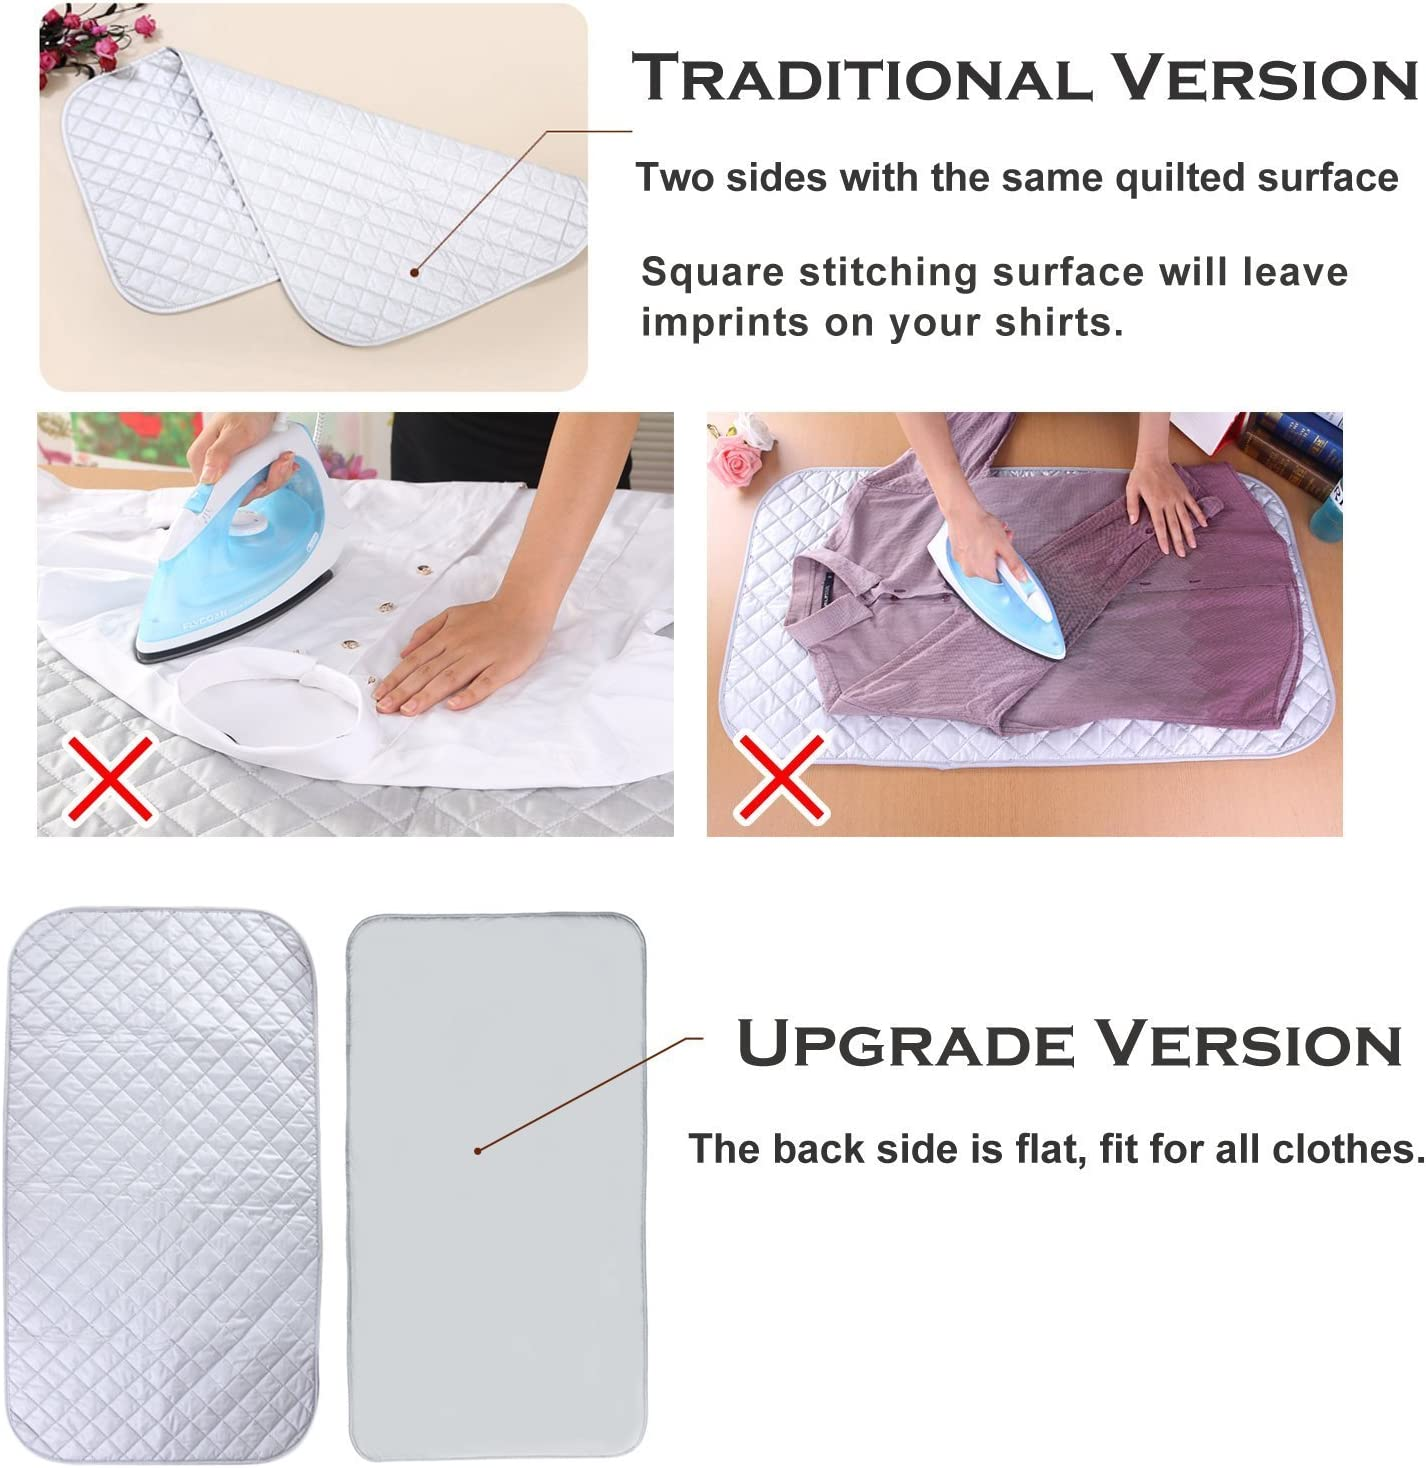 Garneck 6PCS Ironing Clothes Mat Ironing Board Mat Anti-Scald Ironing Mat Heat Insulated Ironing Clothes Pad Grey 5038cm